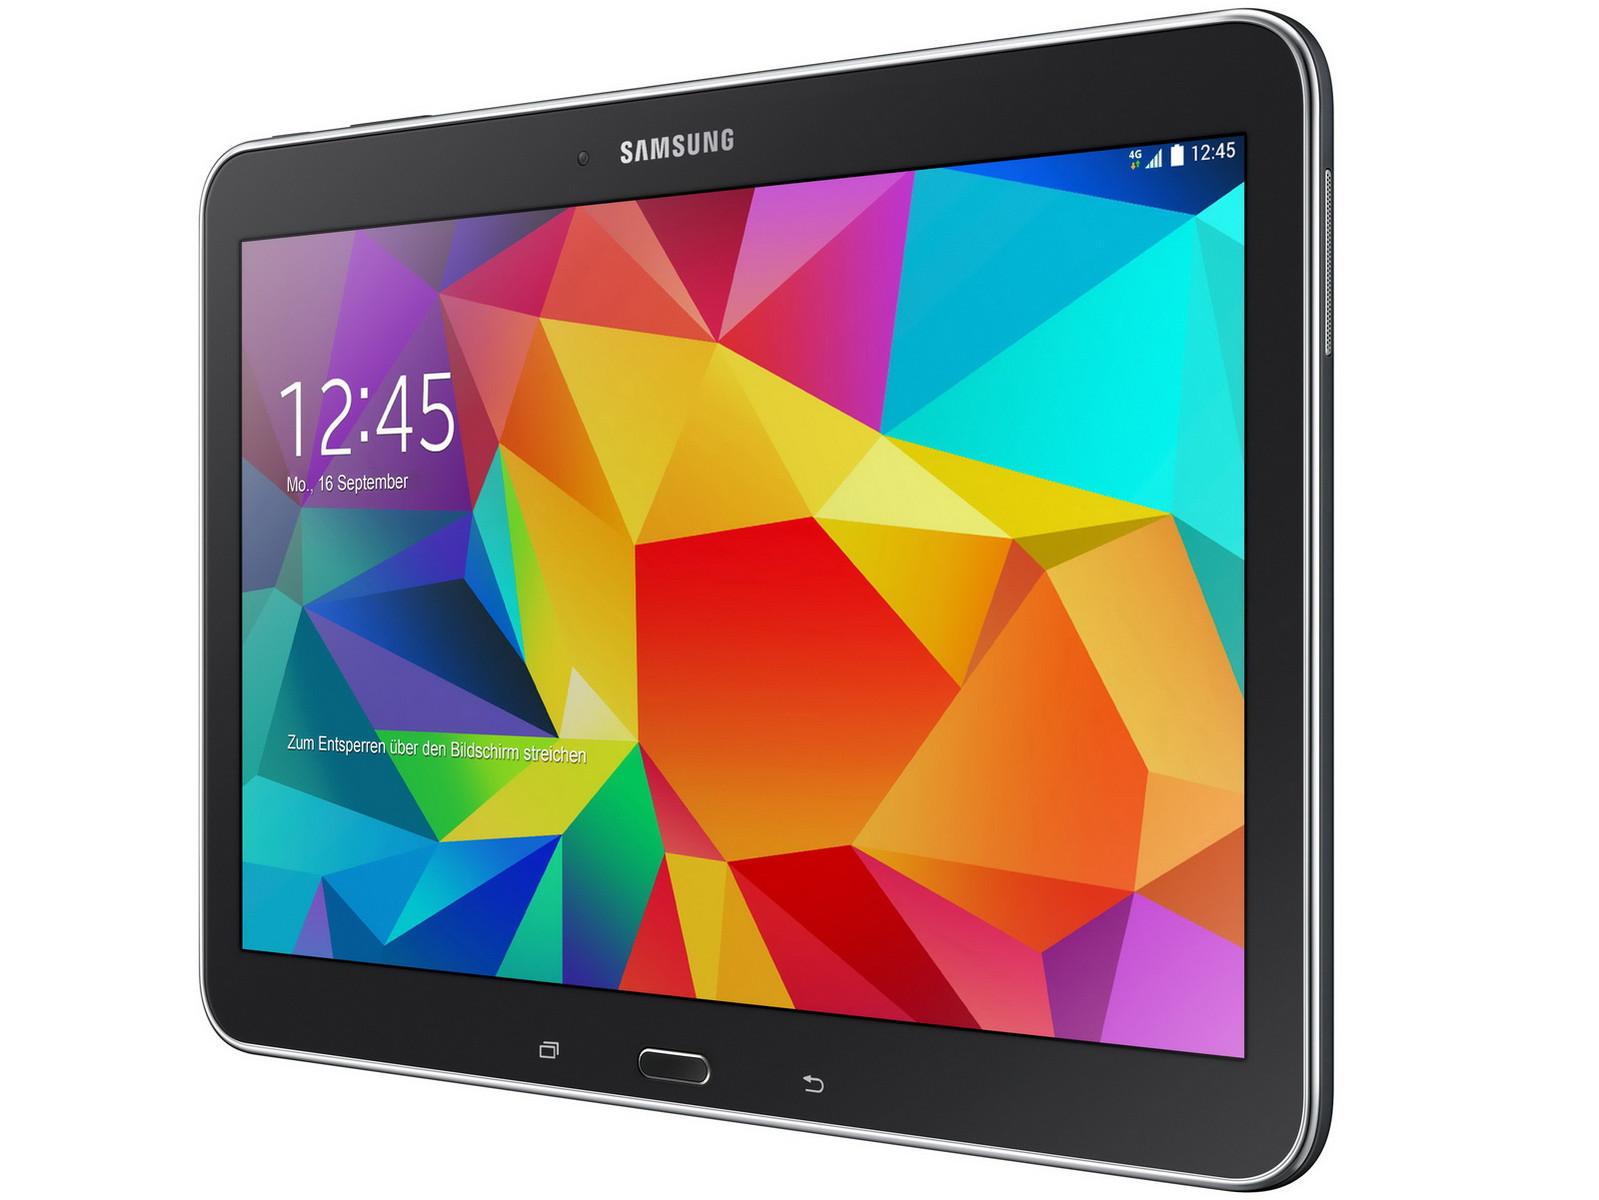 marktstart samsung tablets galaxy tab 4 7 0 tab 4 8 0. Black Bedroom Furniture Sets. Home Design Ideas